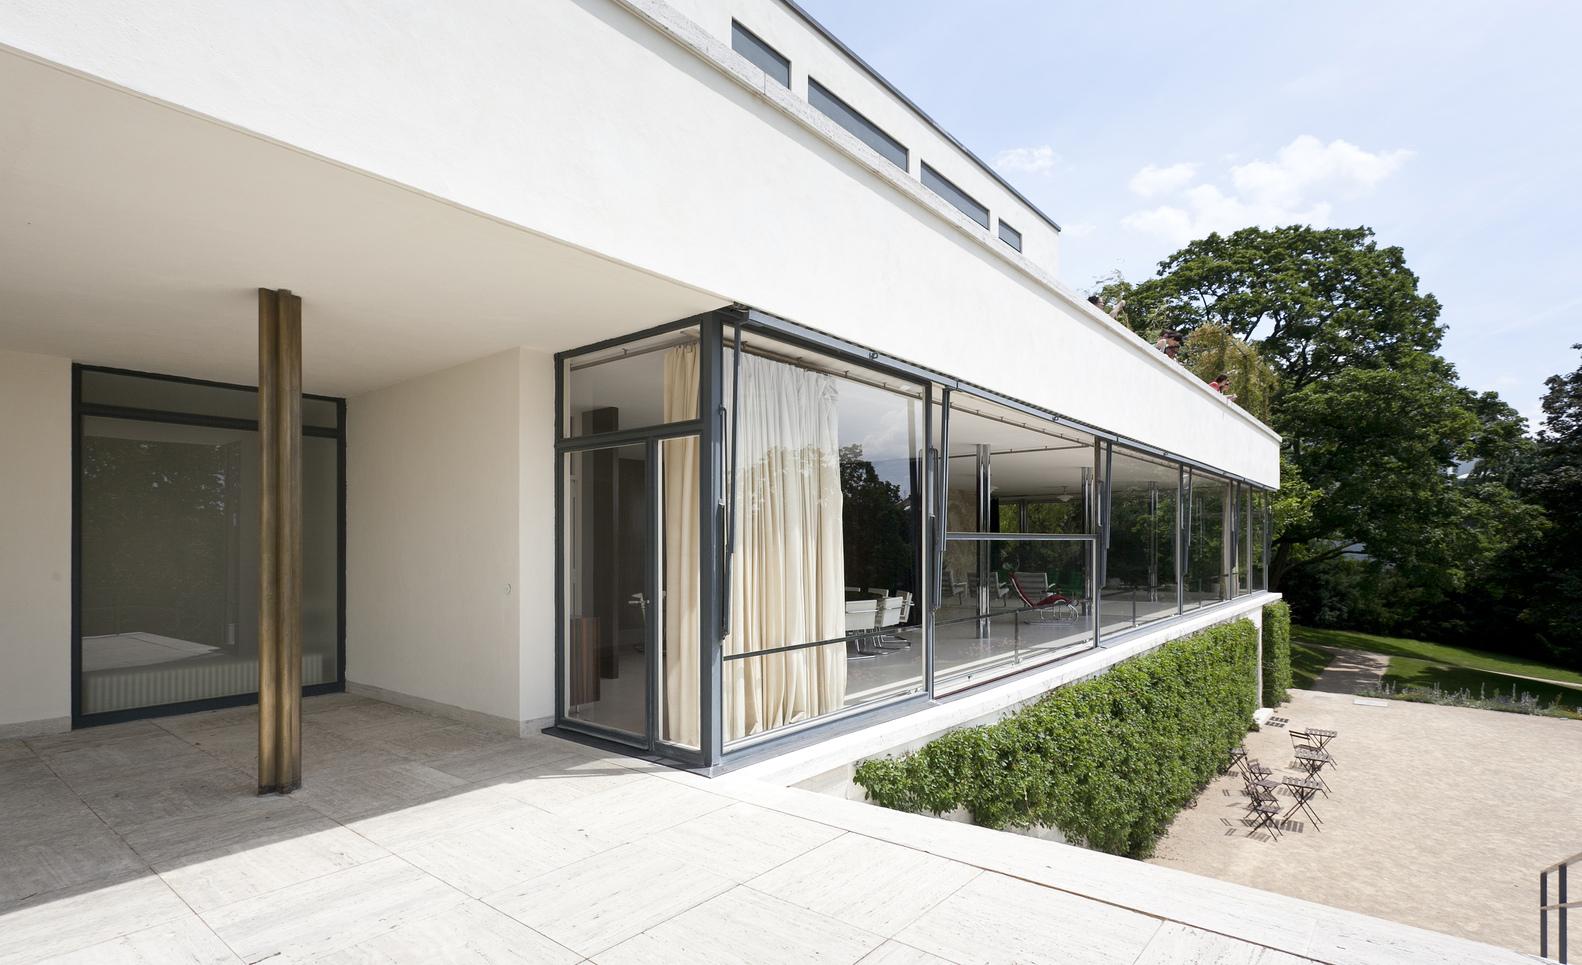 gallery of ad classics villa tugendhat mies van der rohe 22. Black Bedroom Furniture Sets. Home Design Ideas